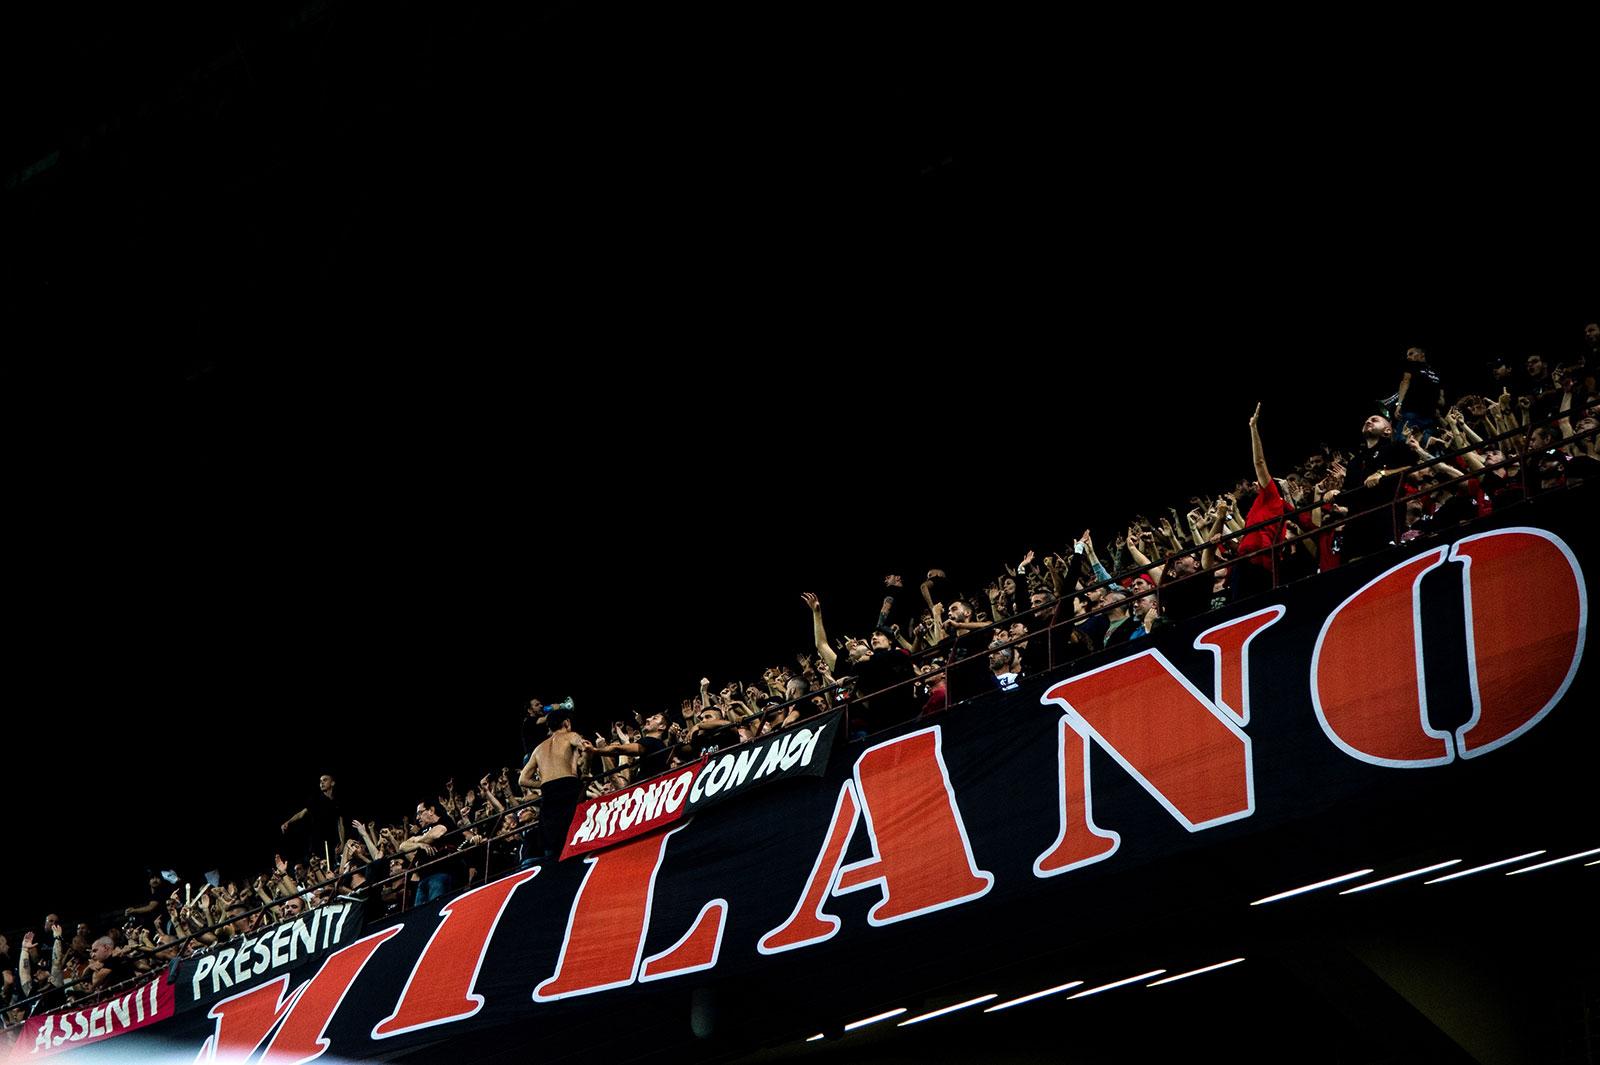 Milan fans during Milan-Roma at Stadio San Siro on August 31, 2018. (MARCO BERTORELLO/AFP/Getty Images)